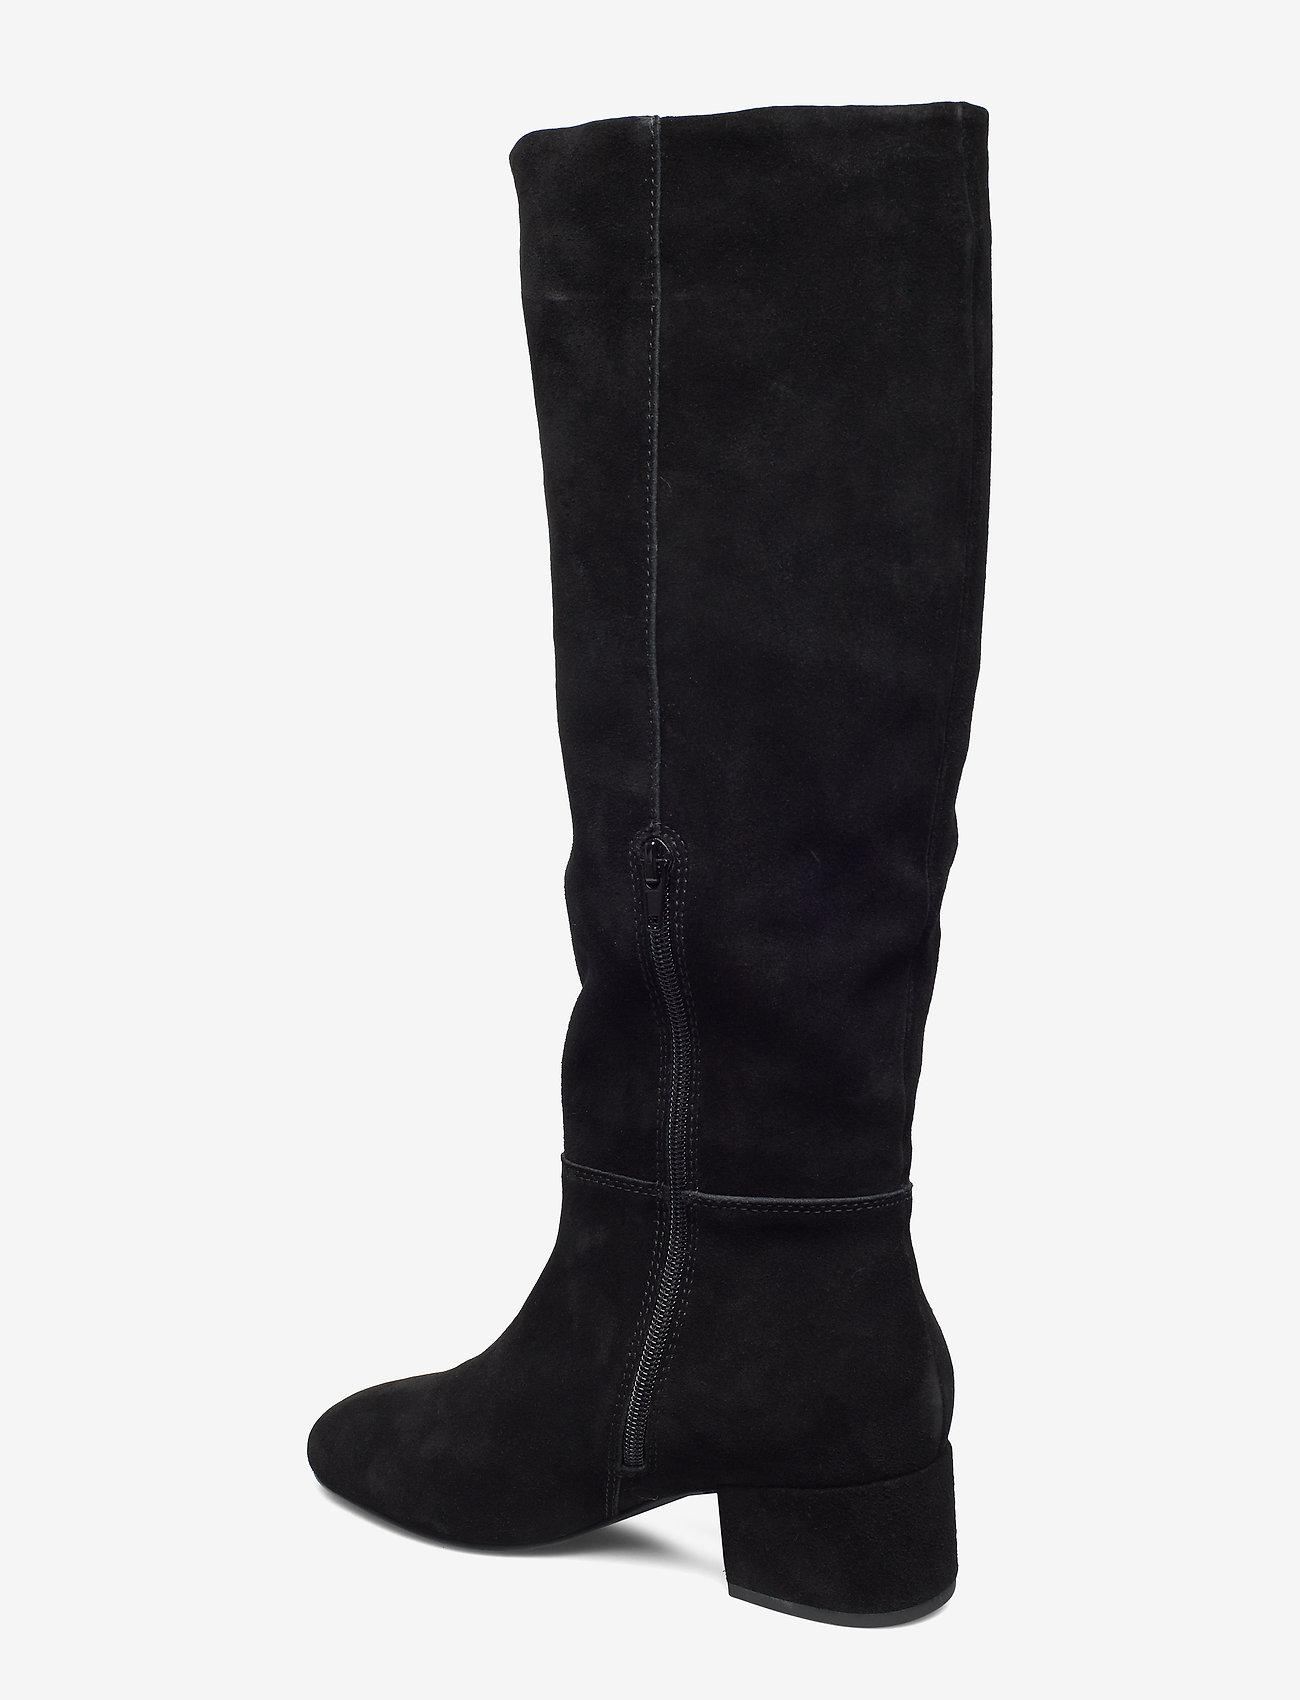 Shoe The Bear SOPHY TALL BOOT S - Stiefel BLACK - Schuhe Billige